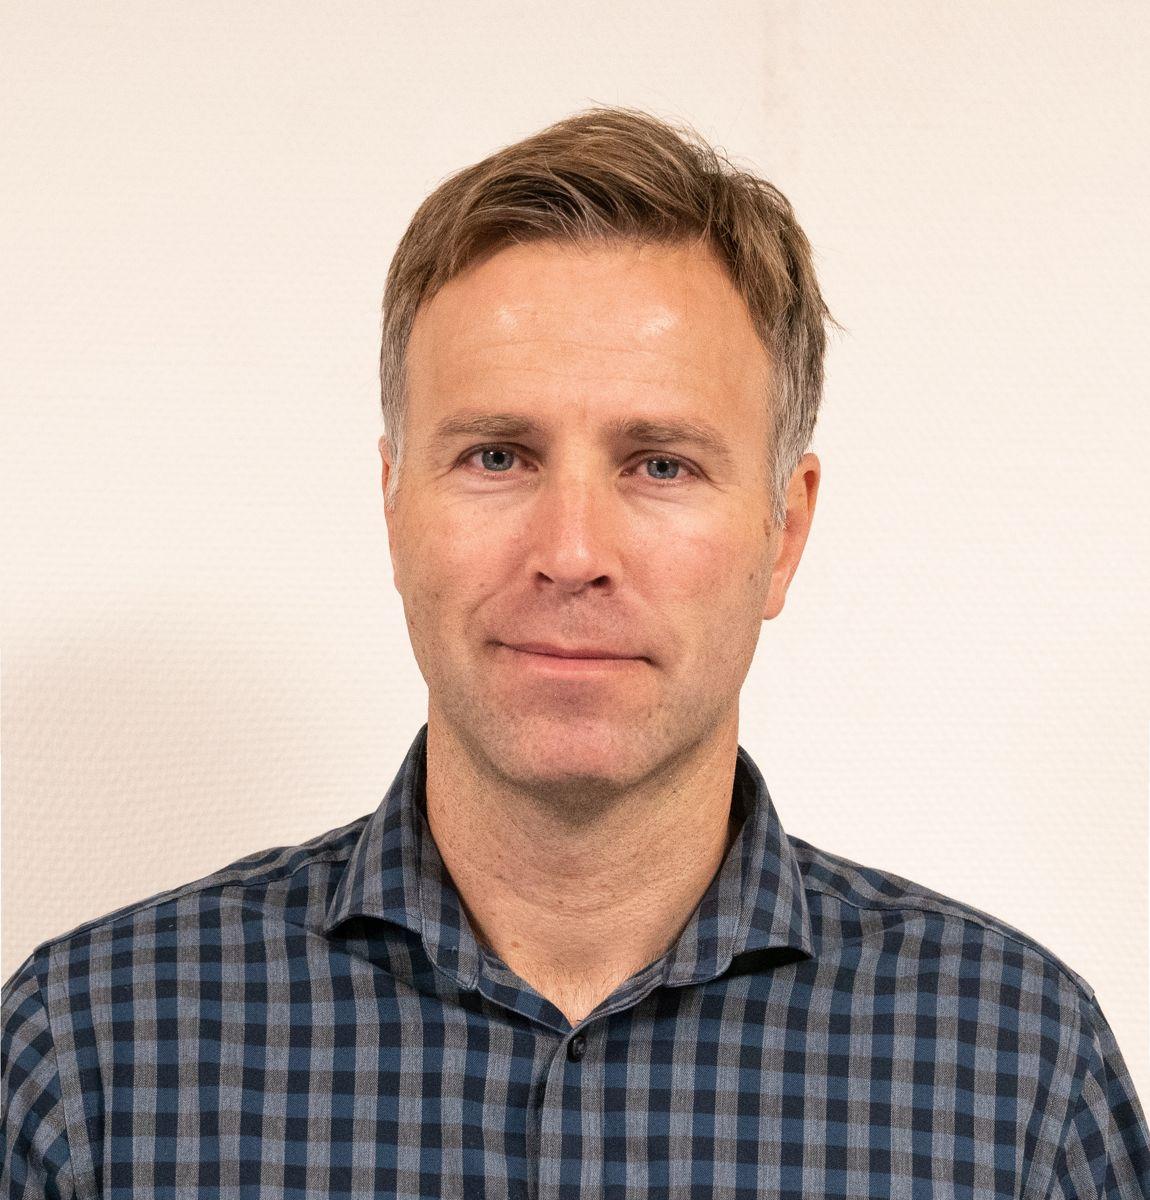 Frode Myrmel, produktsjef i BMI Norge. Foto: BMI